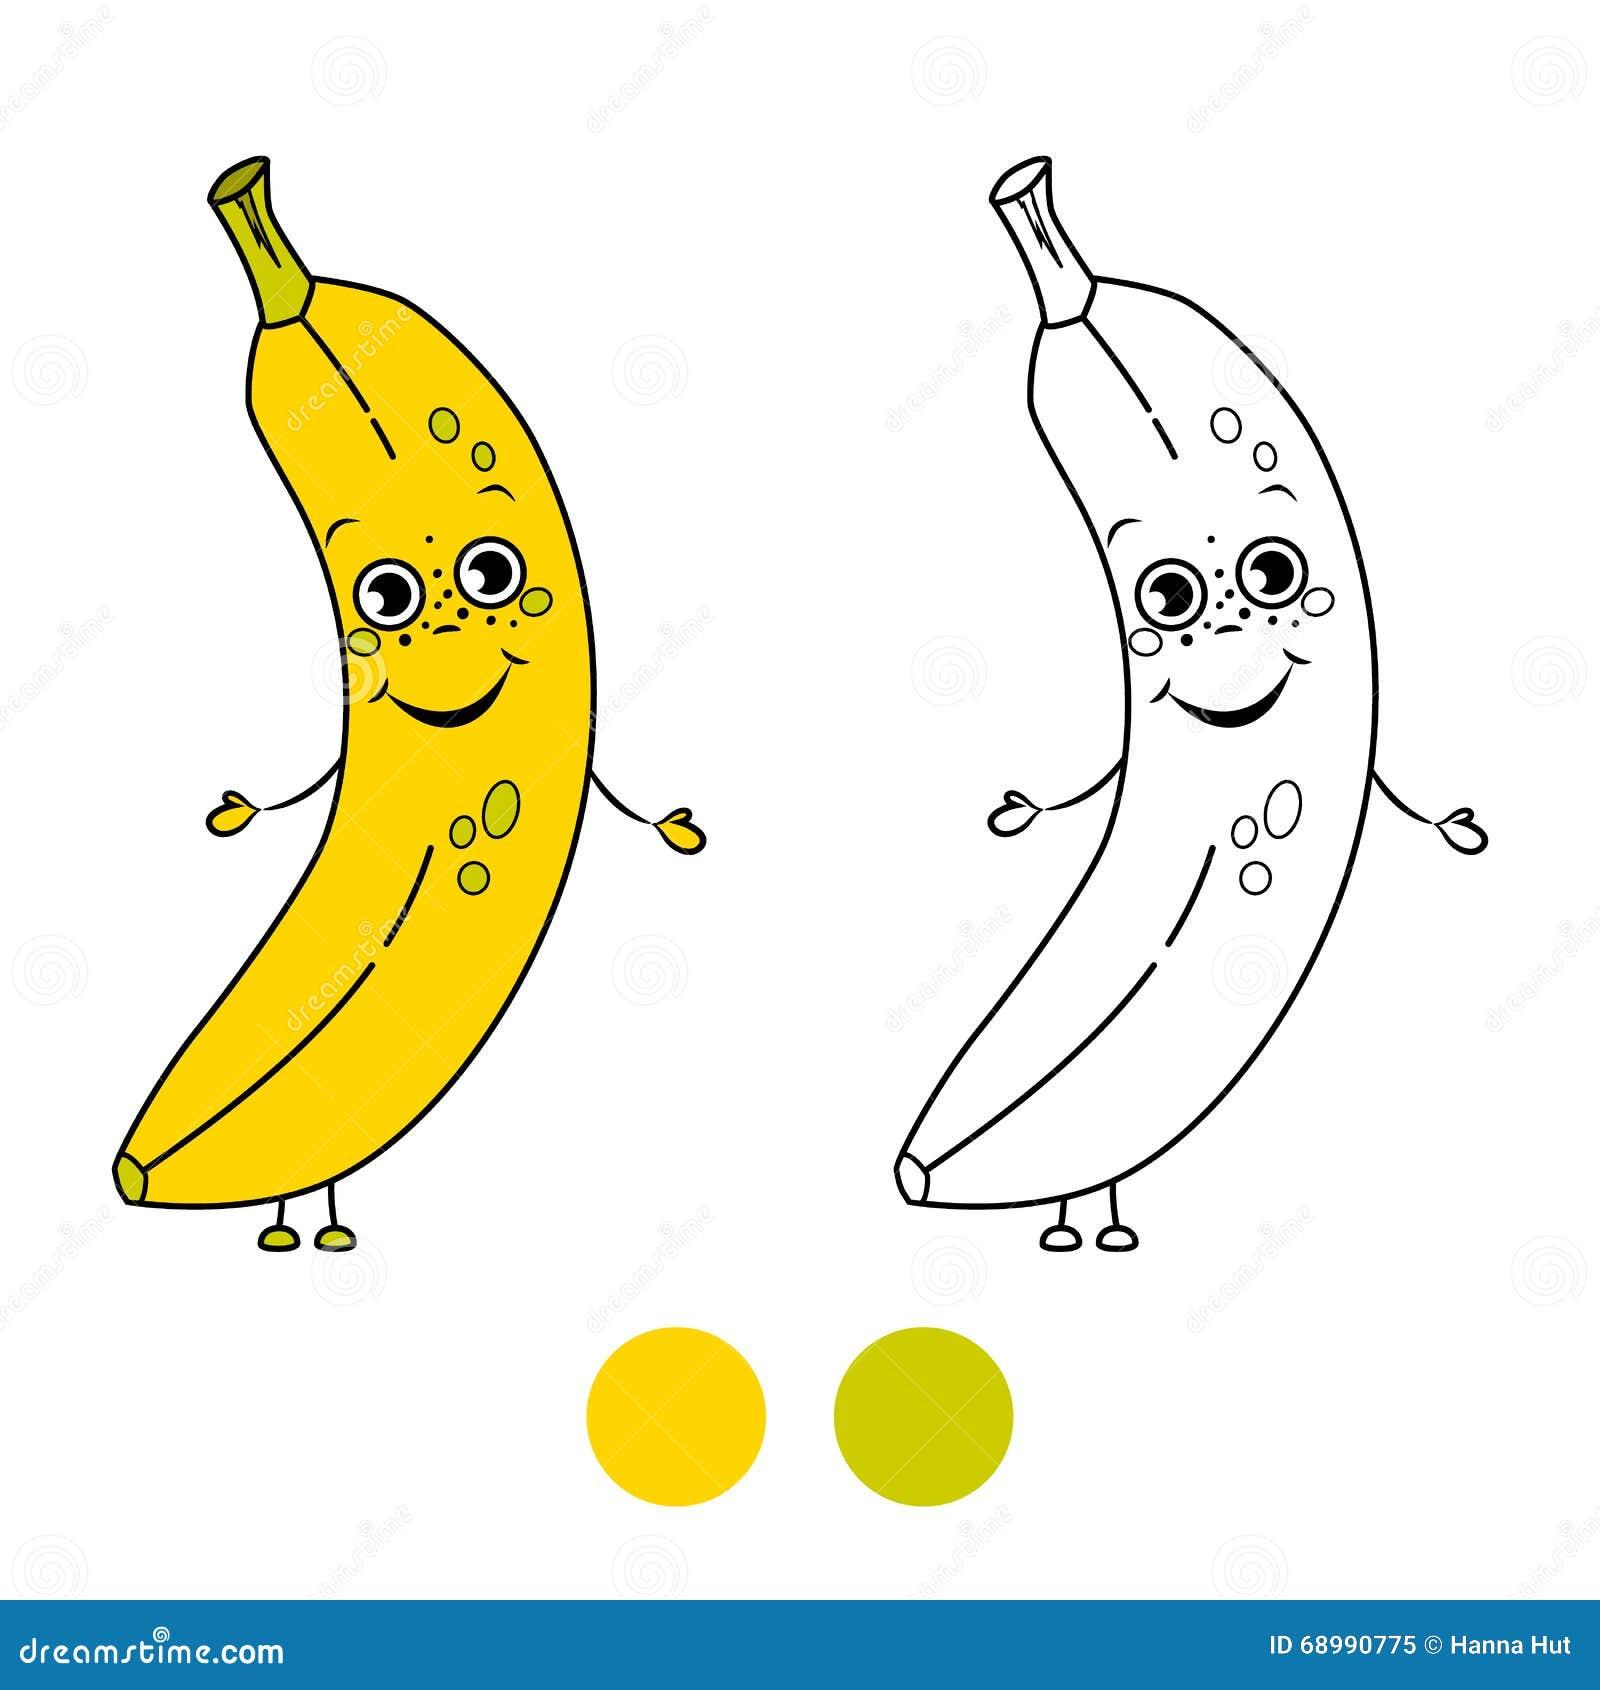 banana coloring book page stock vector image 68990775